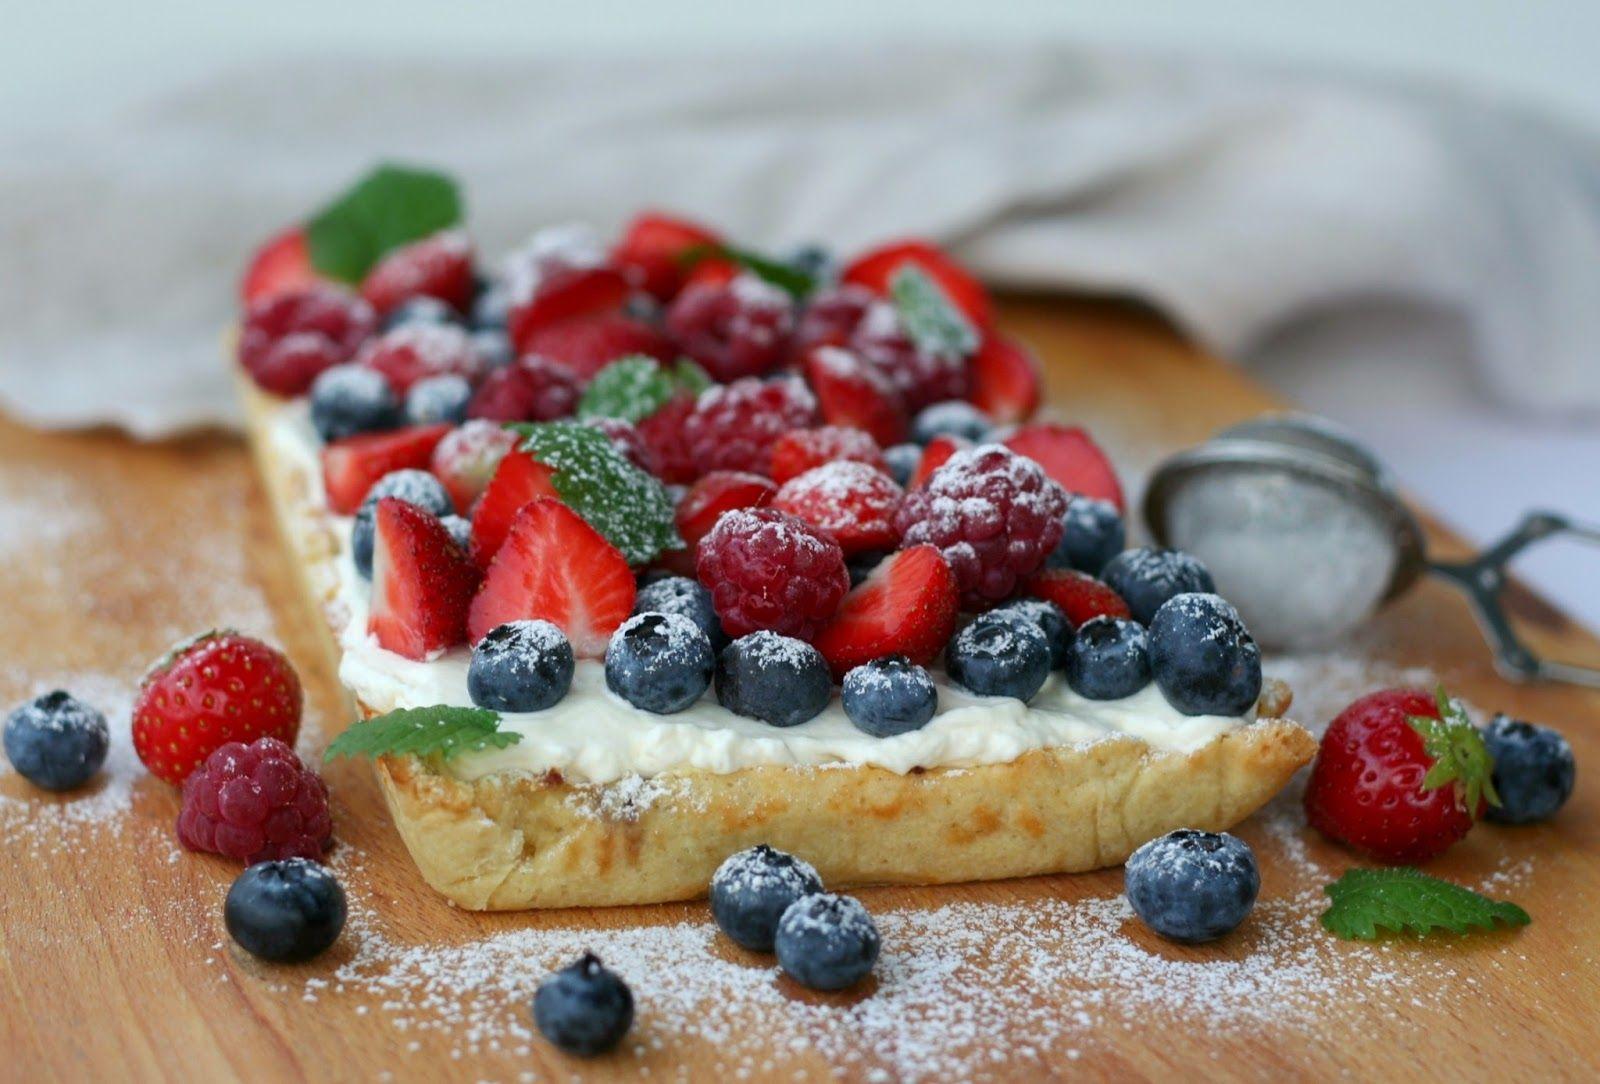 Baking of...: Marja-vaniljapiiras